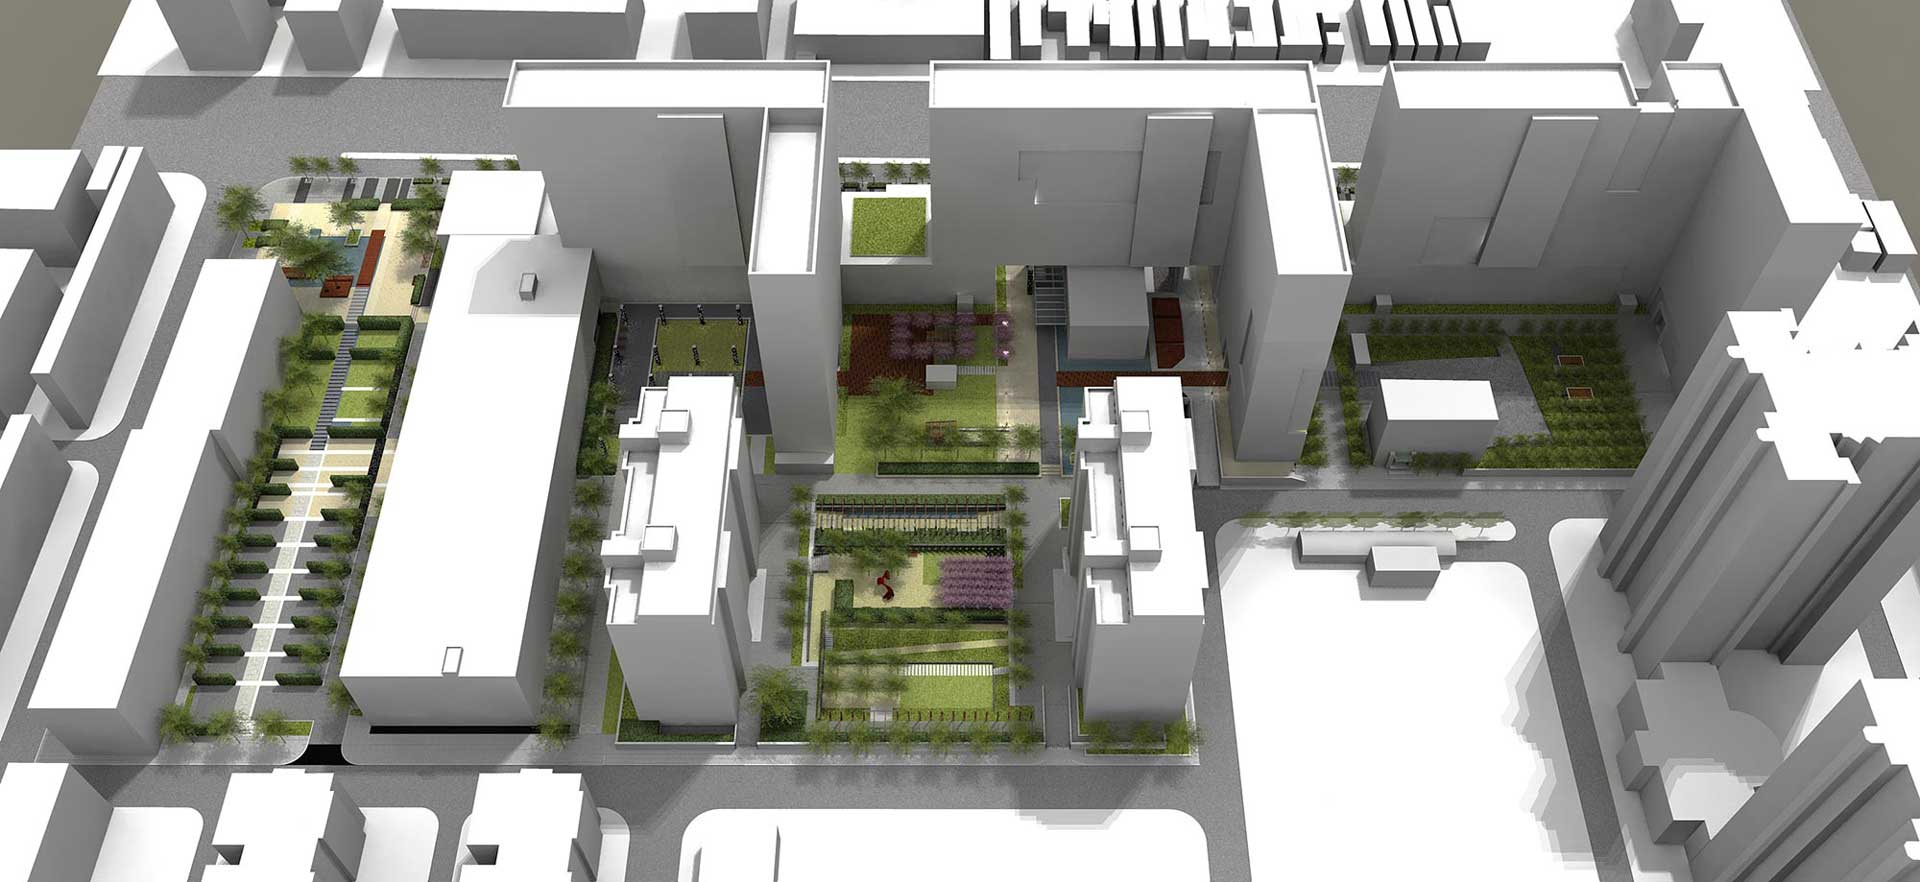 Park-Five_Klopfer-Martin-Design-Group_Birds-view_rendering_courtyard_green-space.jpg